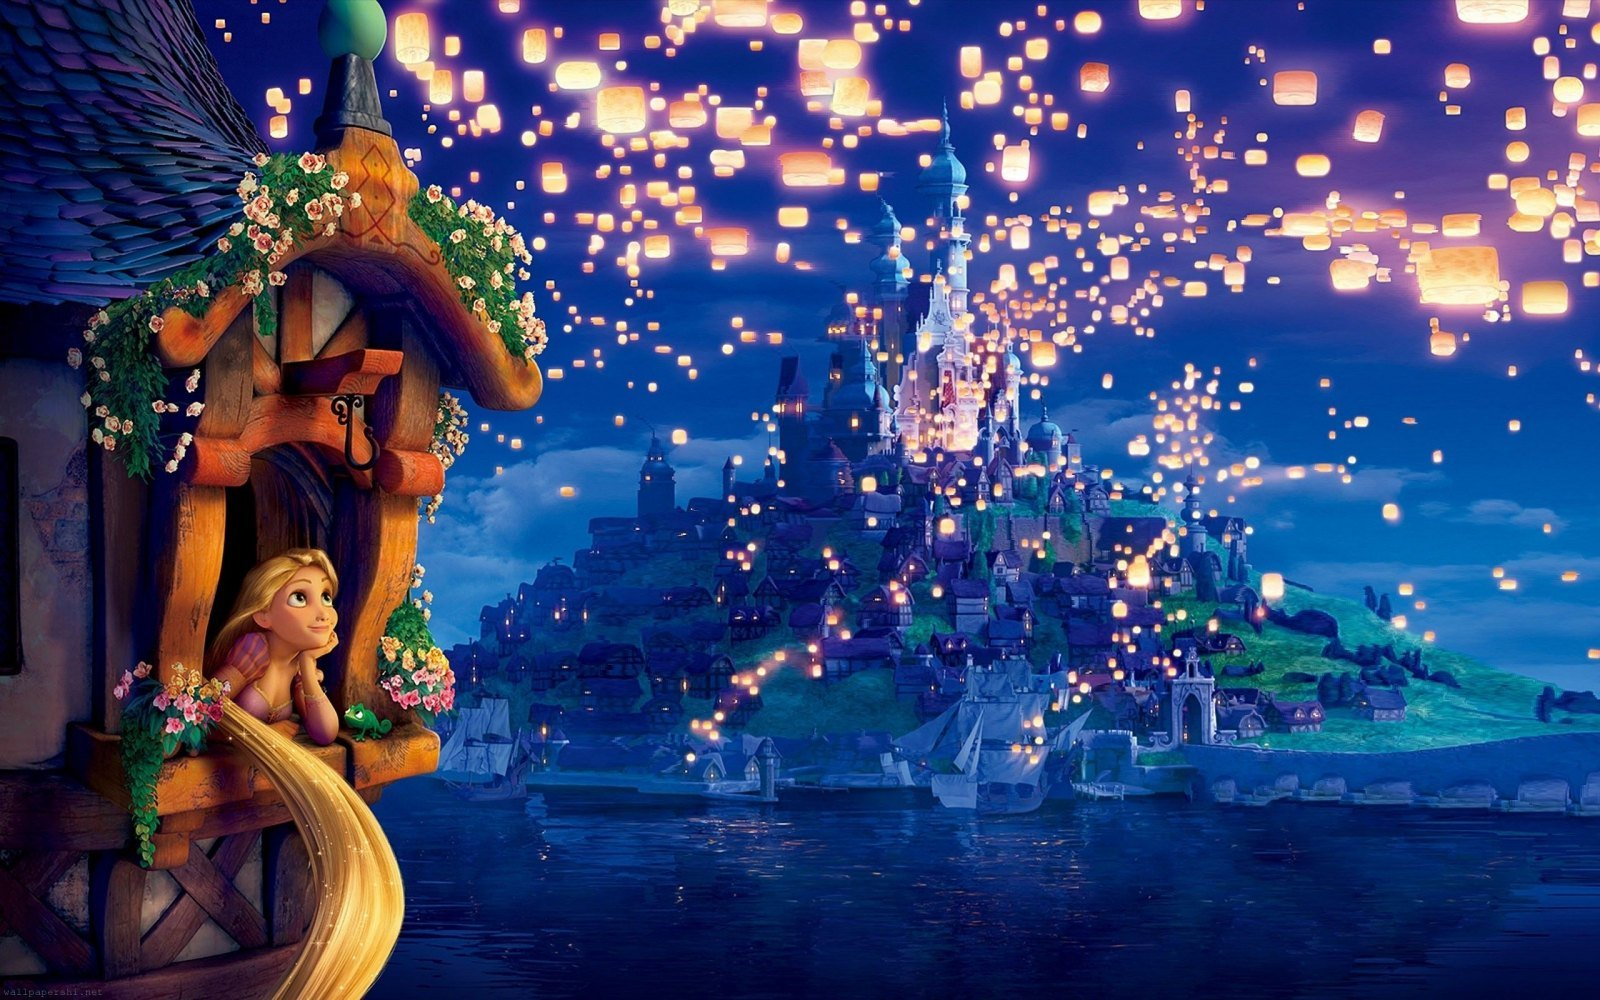 rapunzel-en-el-castillo